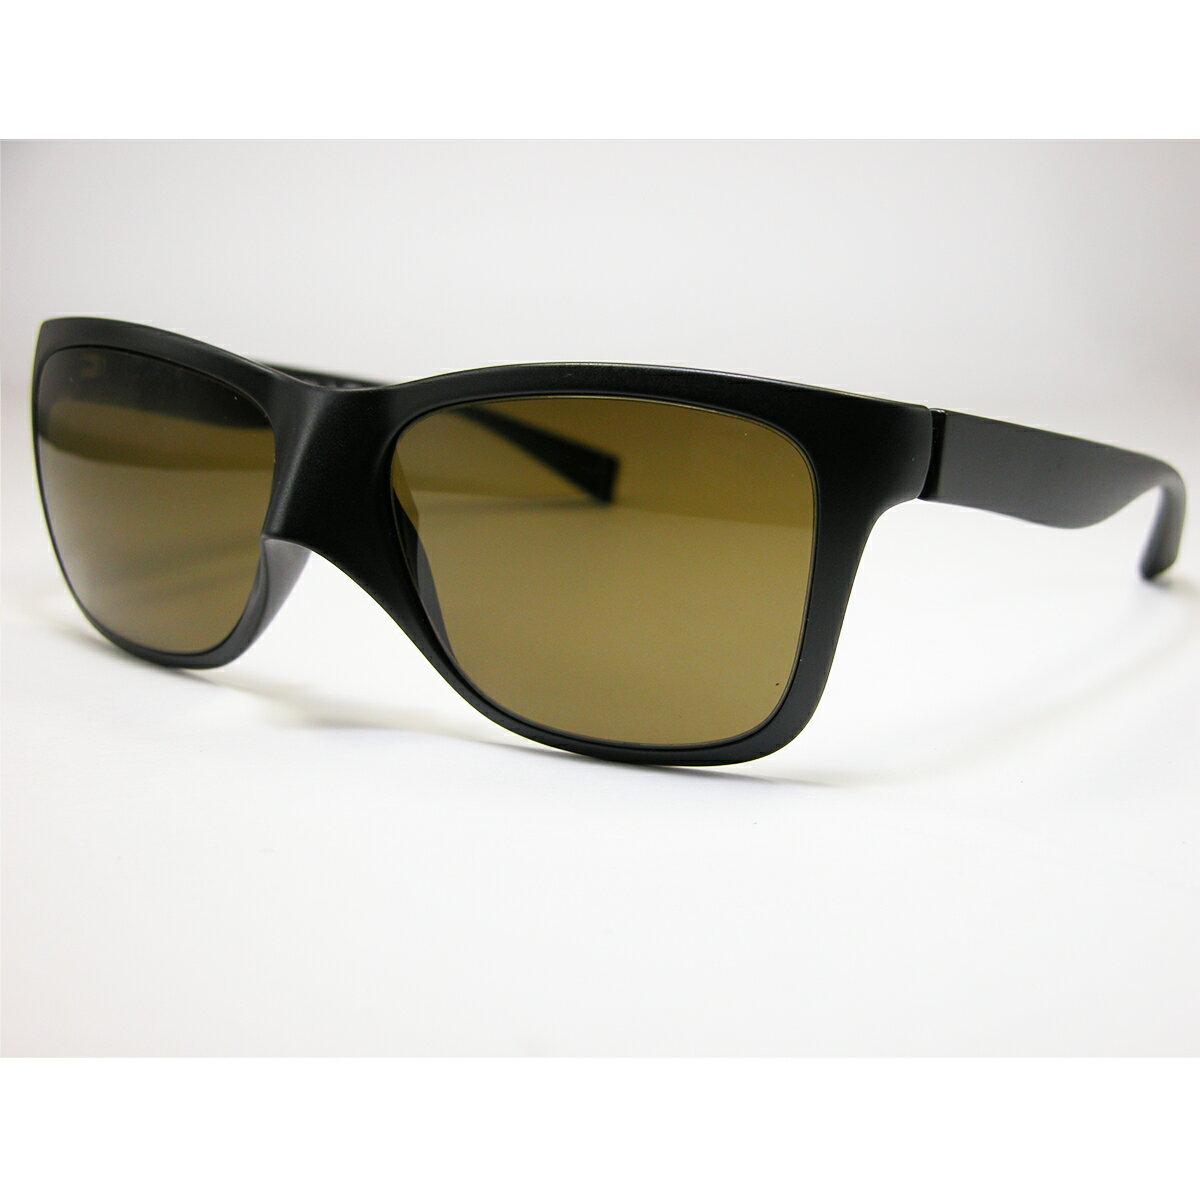 alain mikli アランミクリ メガネAO05018 D101/73【楽ギフ_包装】 メンズ メガネ サングラス 眼鏡【ありがとう】【店頭受取対応商品】